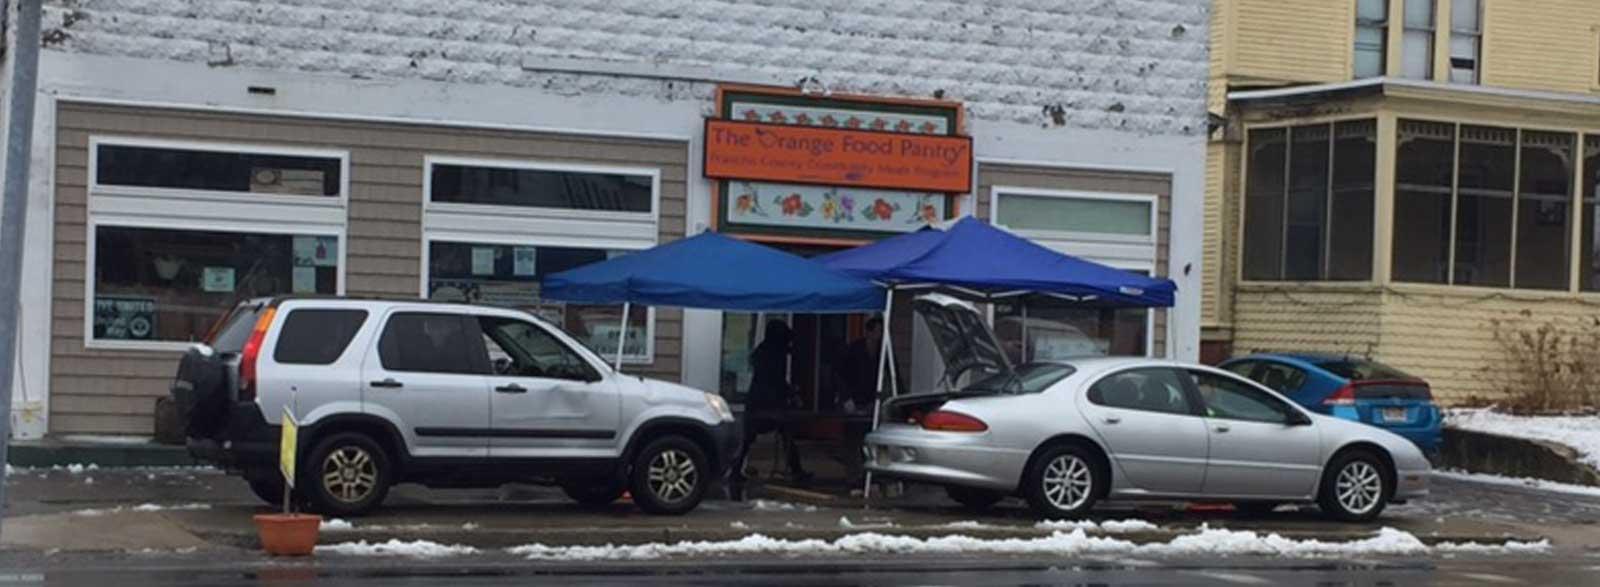 Orange Food Pantry drive thru food pickup